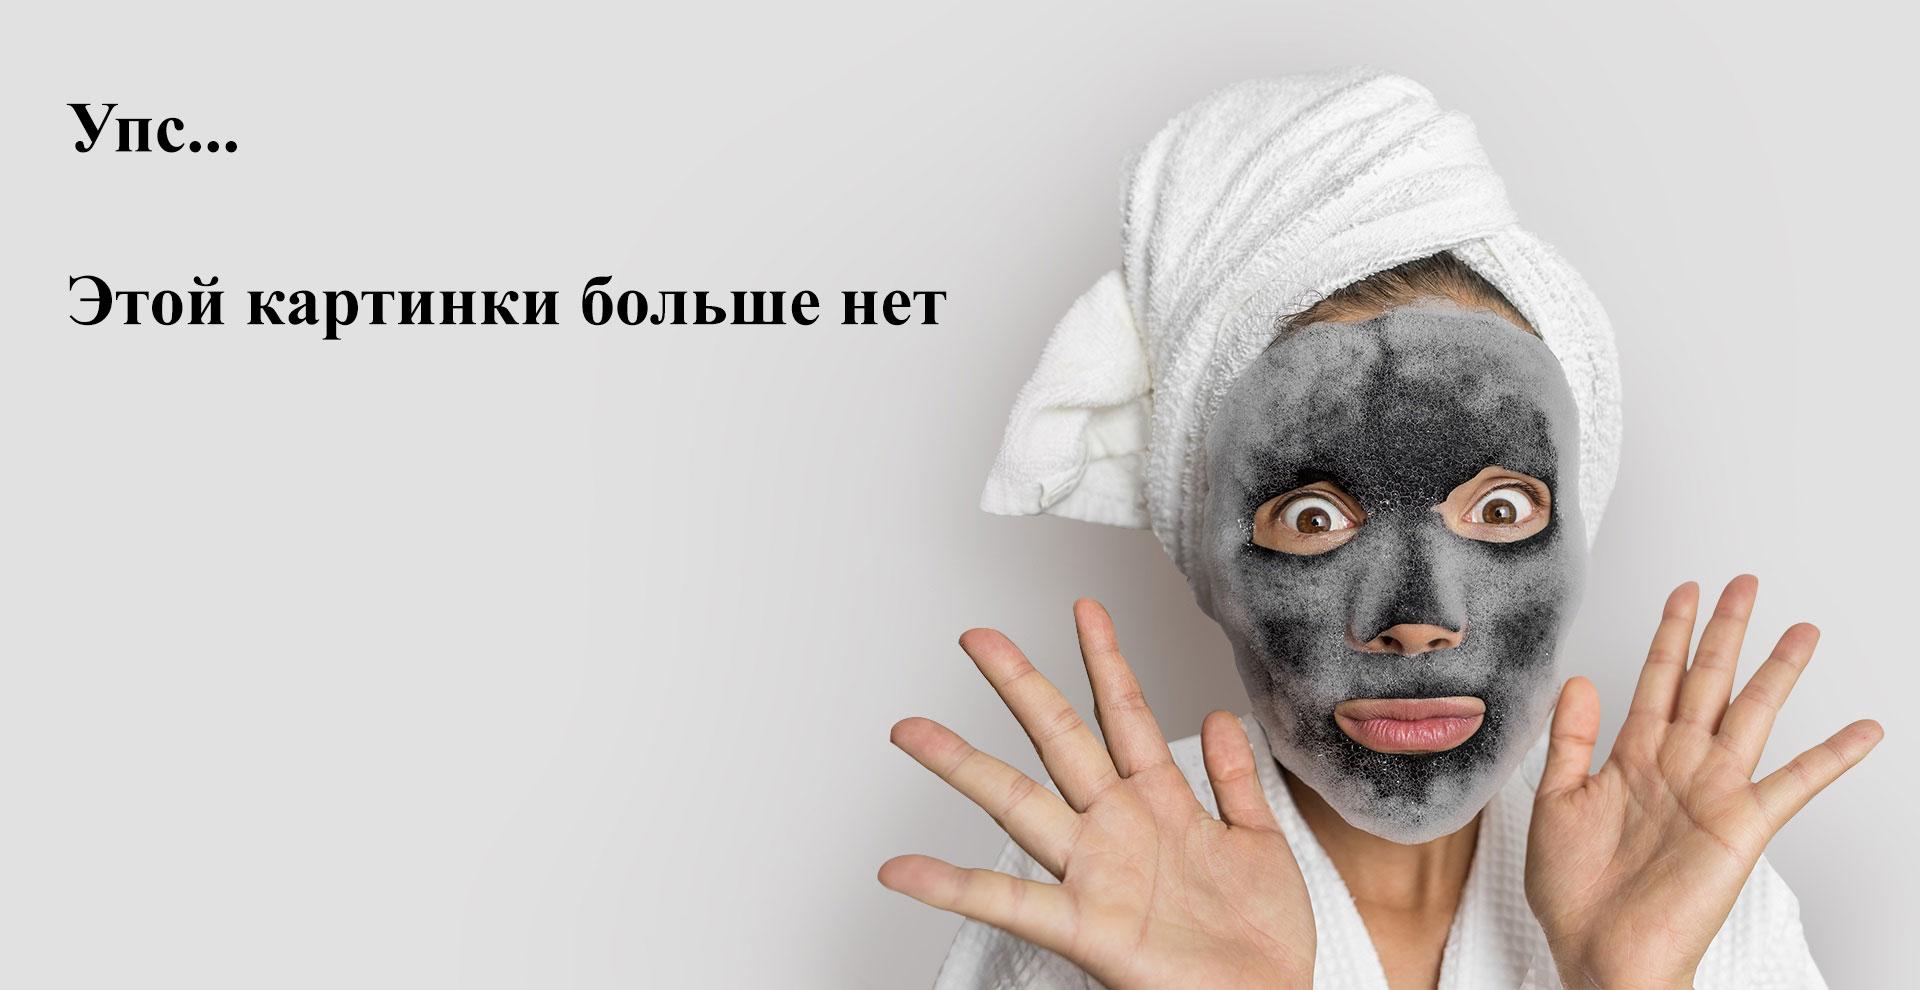 Rosi, Средство для снятия гель-лака «Экстра», 250 мл